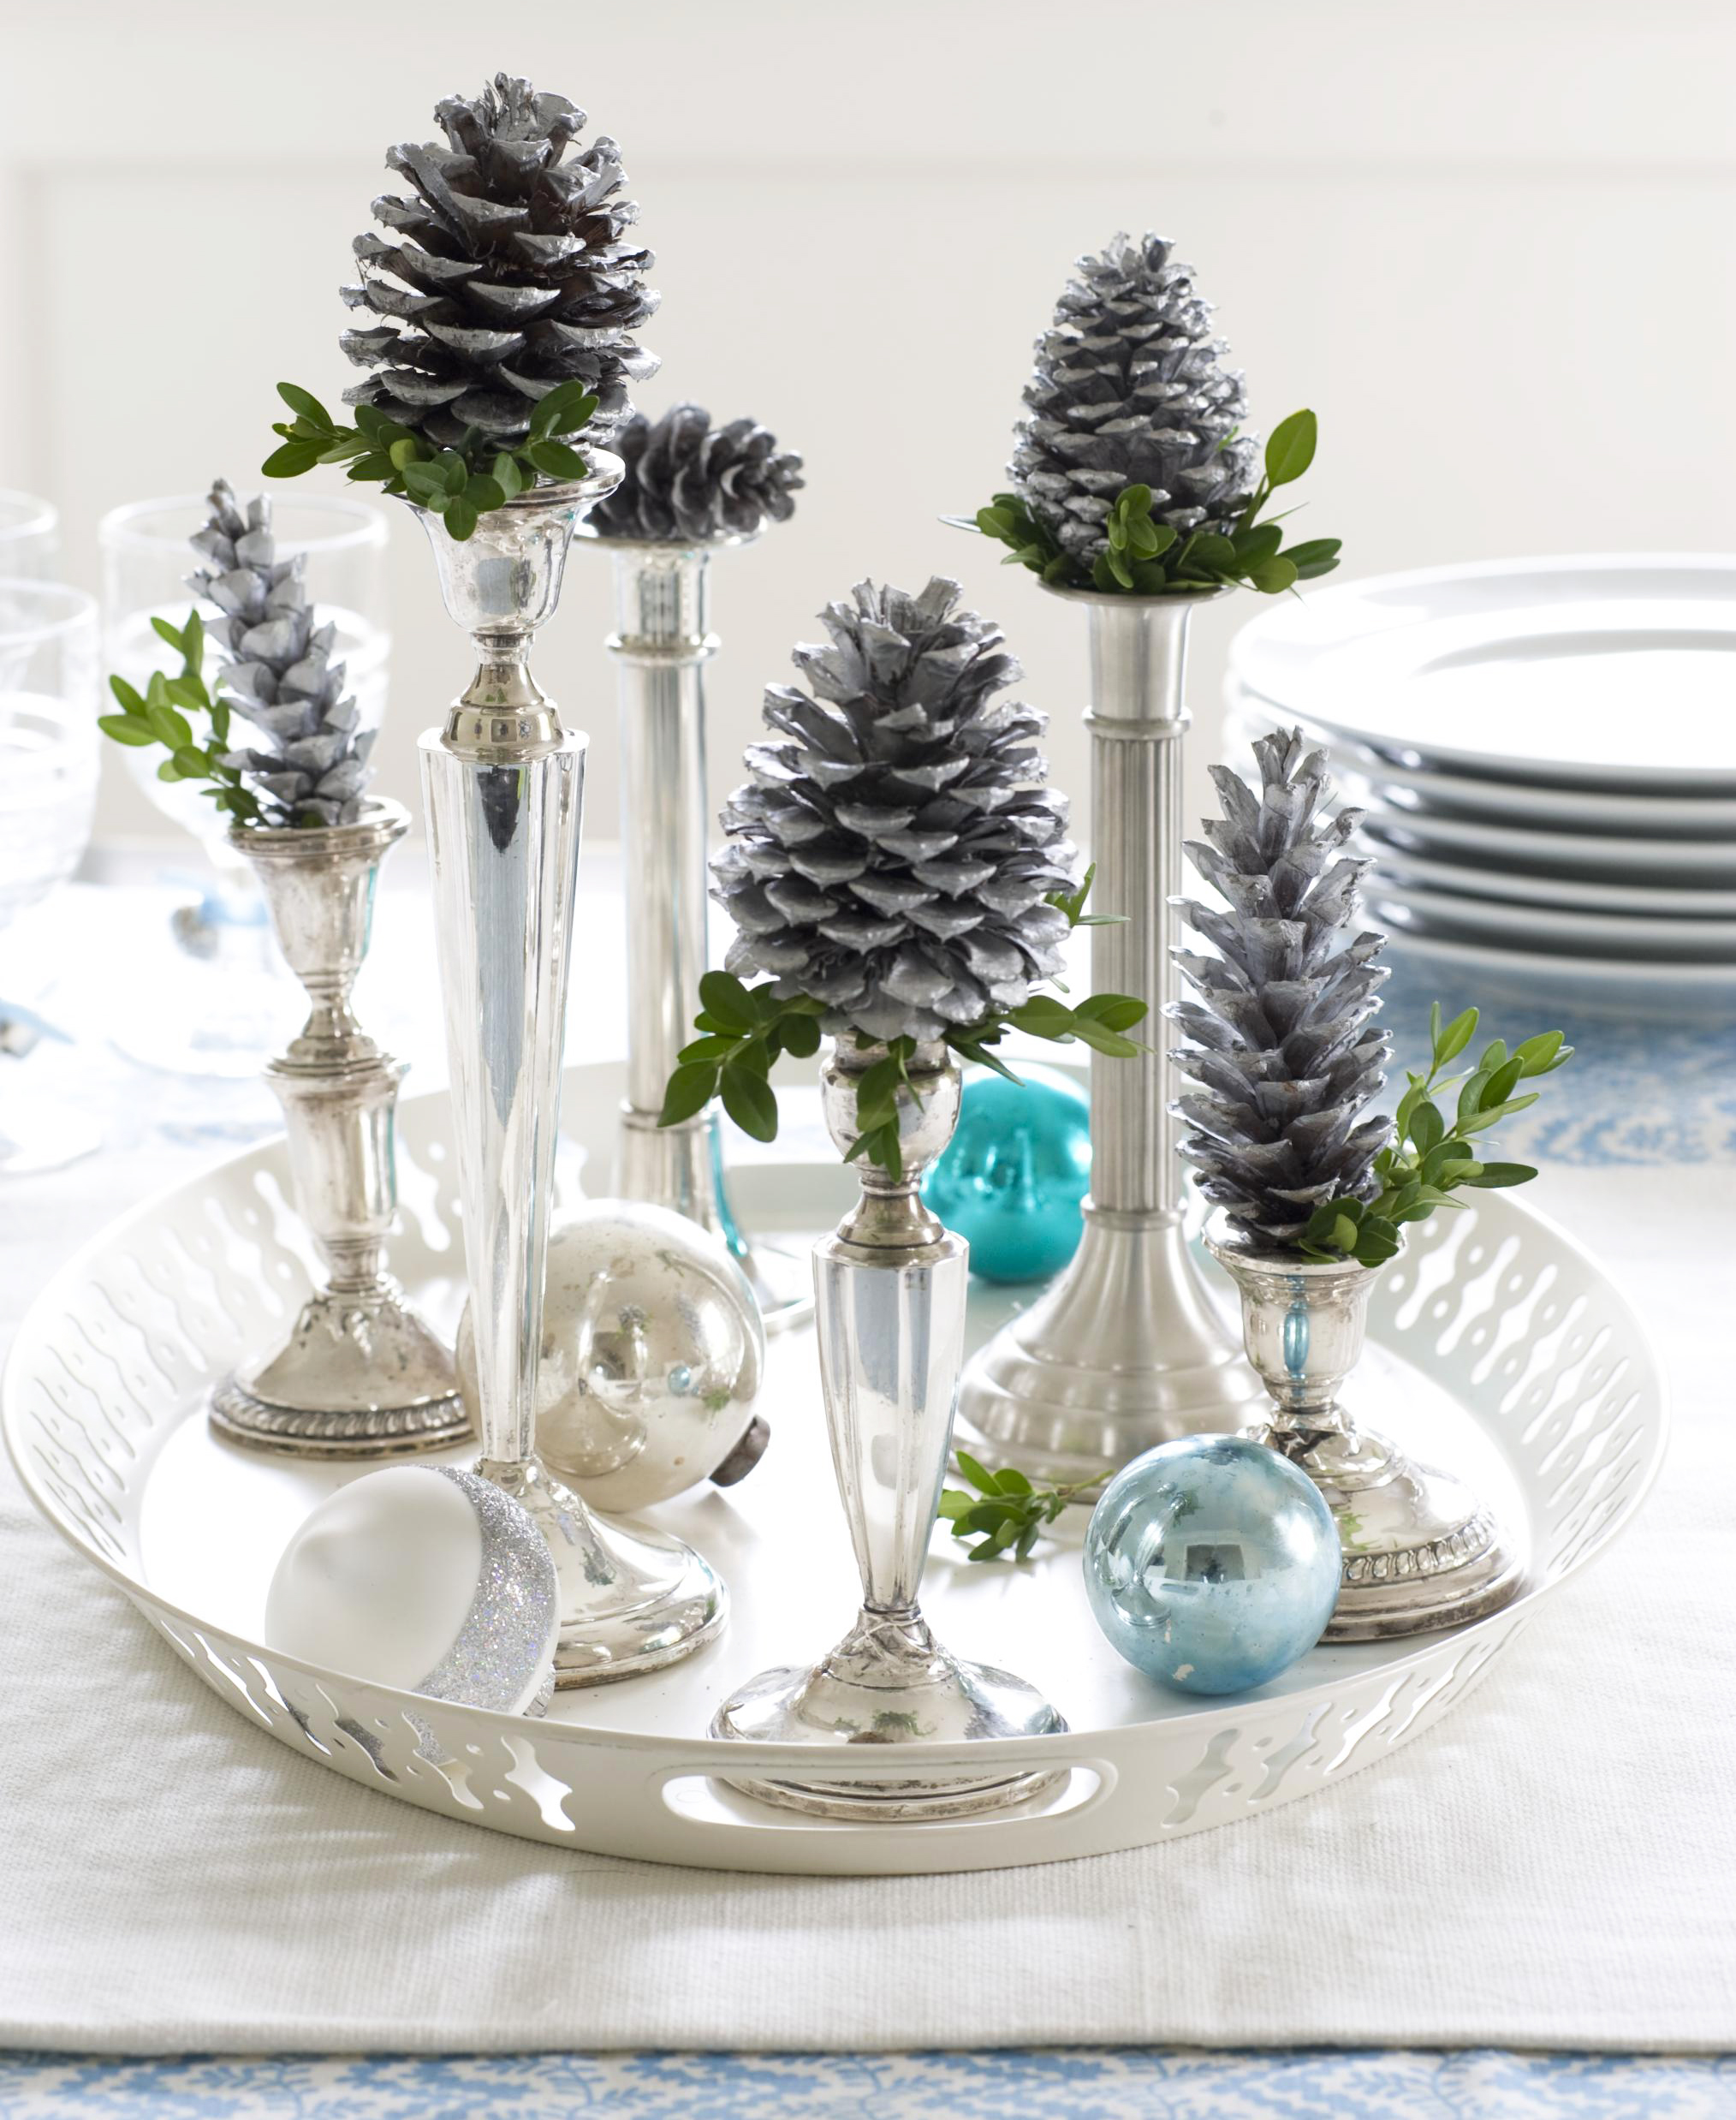 Christmas centerpiece ideas: silver candlesticks